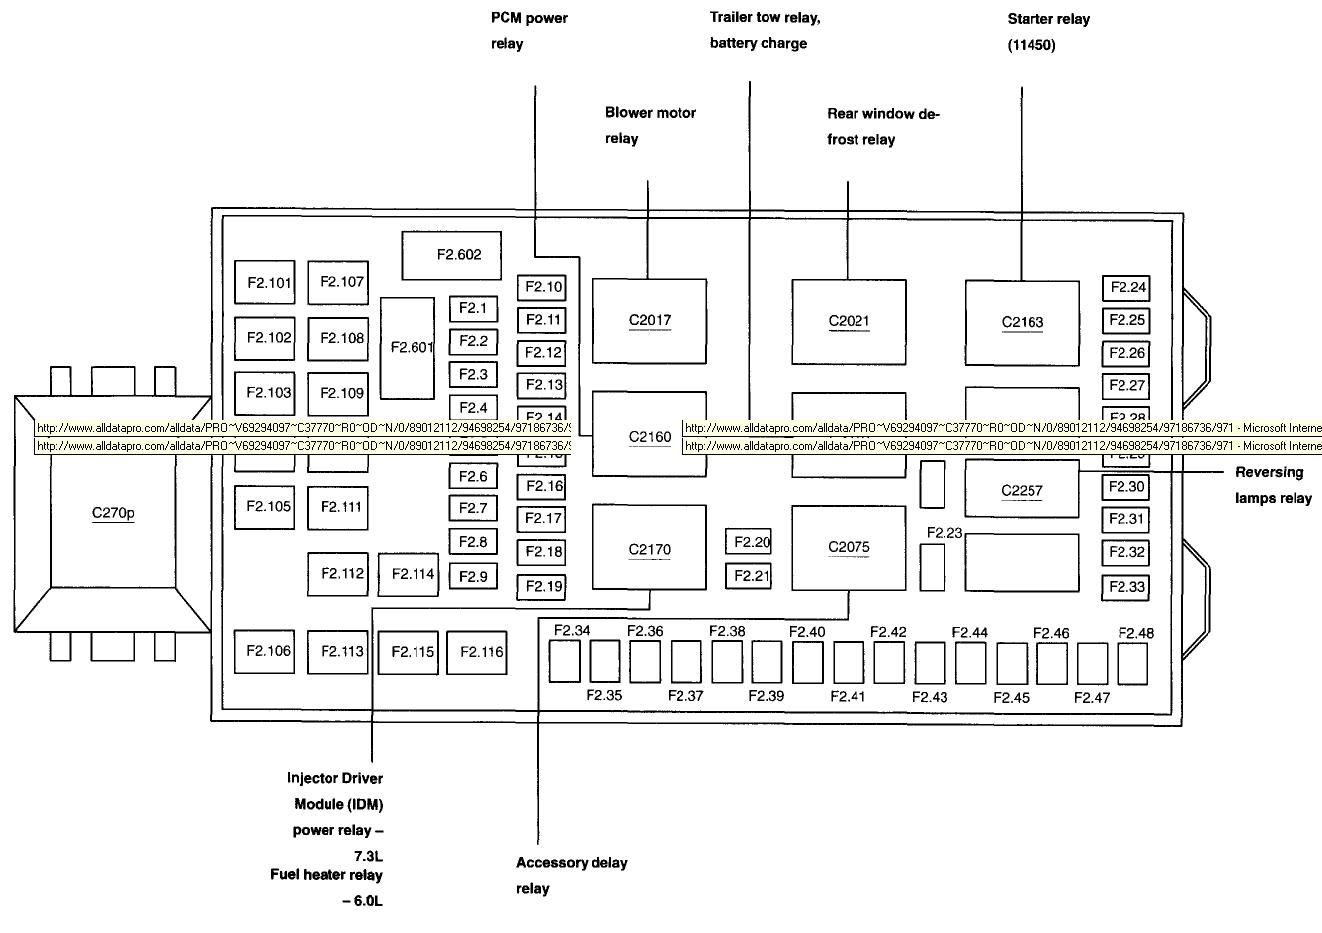 2005 Ford F250 Fuse Box Diagram 2013 Mercedes Sprinter Fuse Box Diagram For Wiring Diagram Schematics